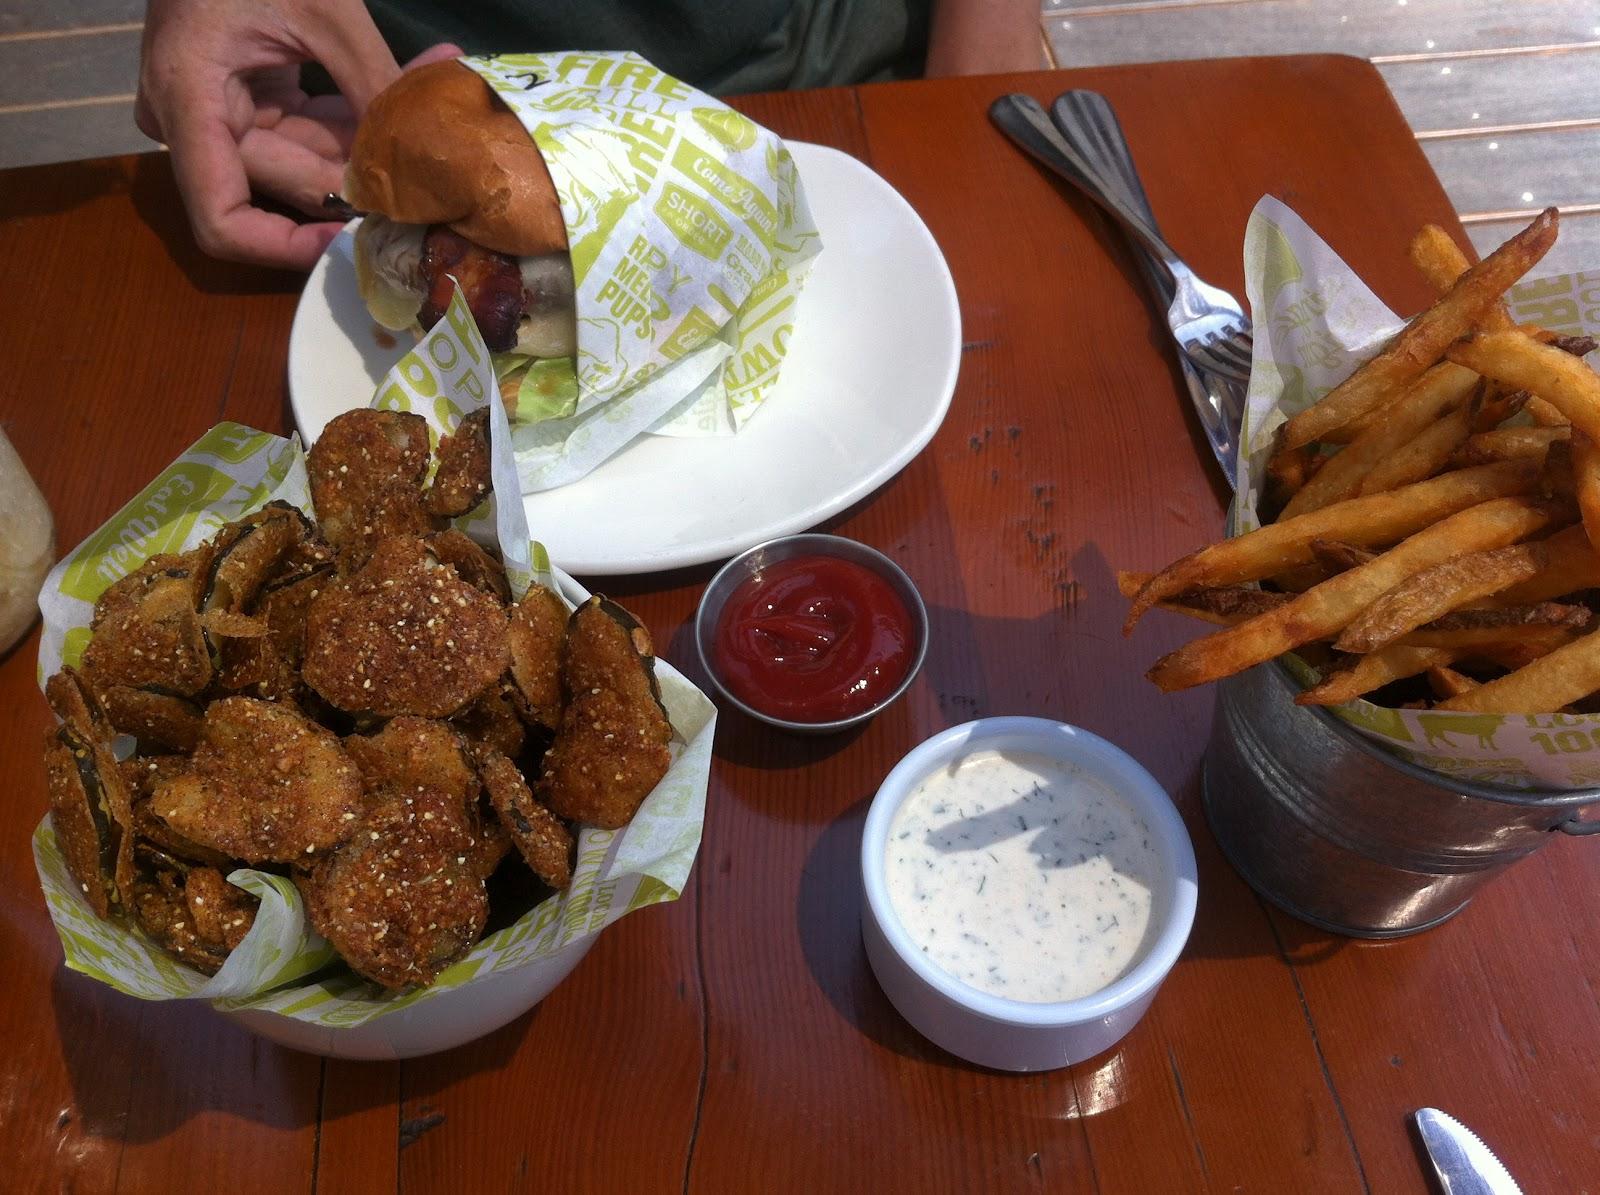 unorthodox foodie hoity toity burgers at short order